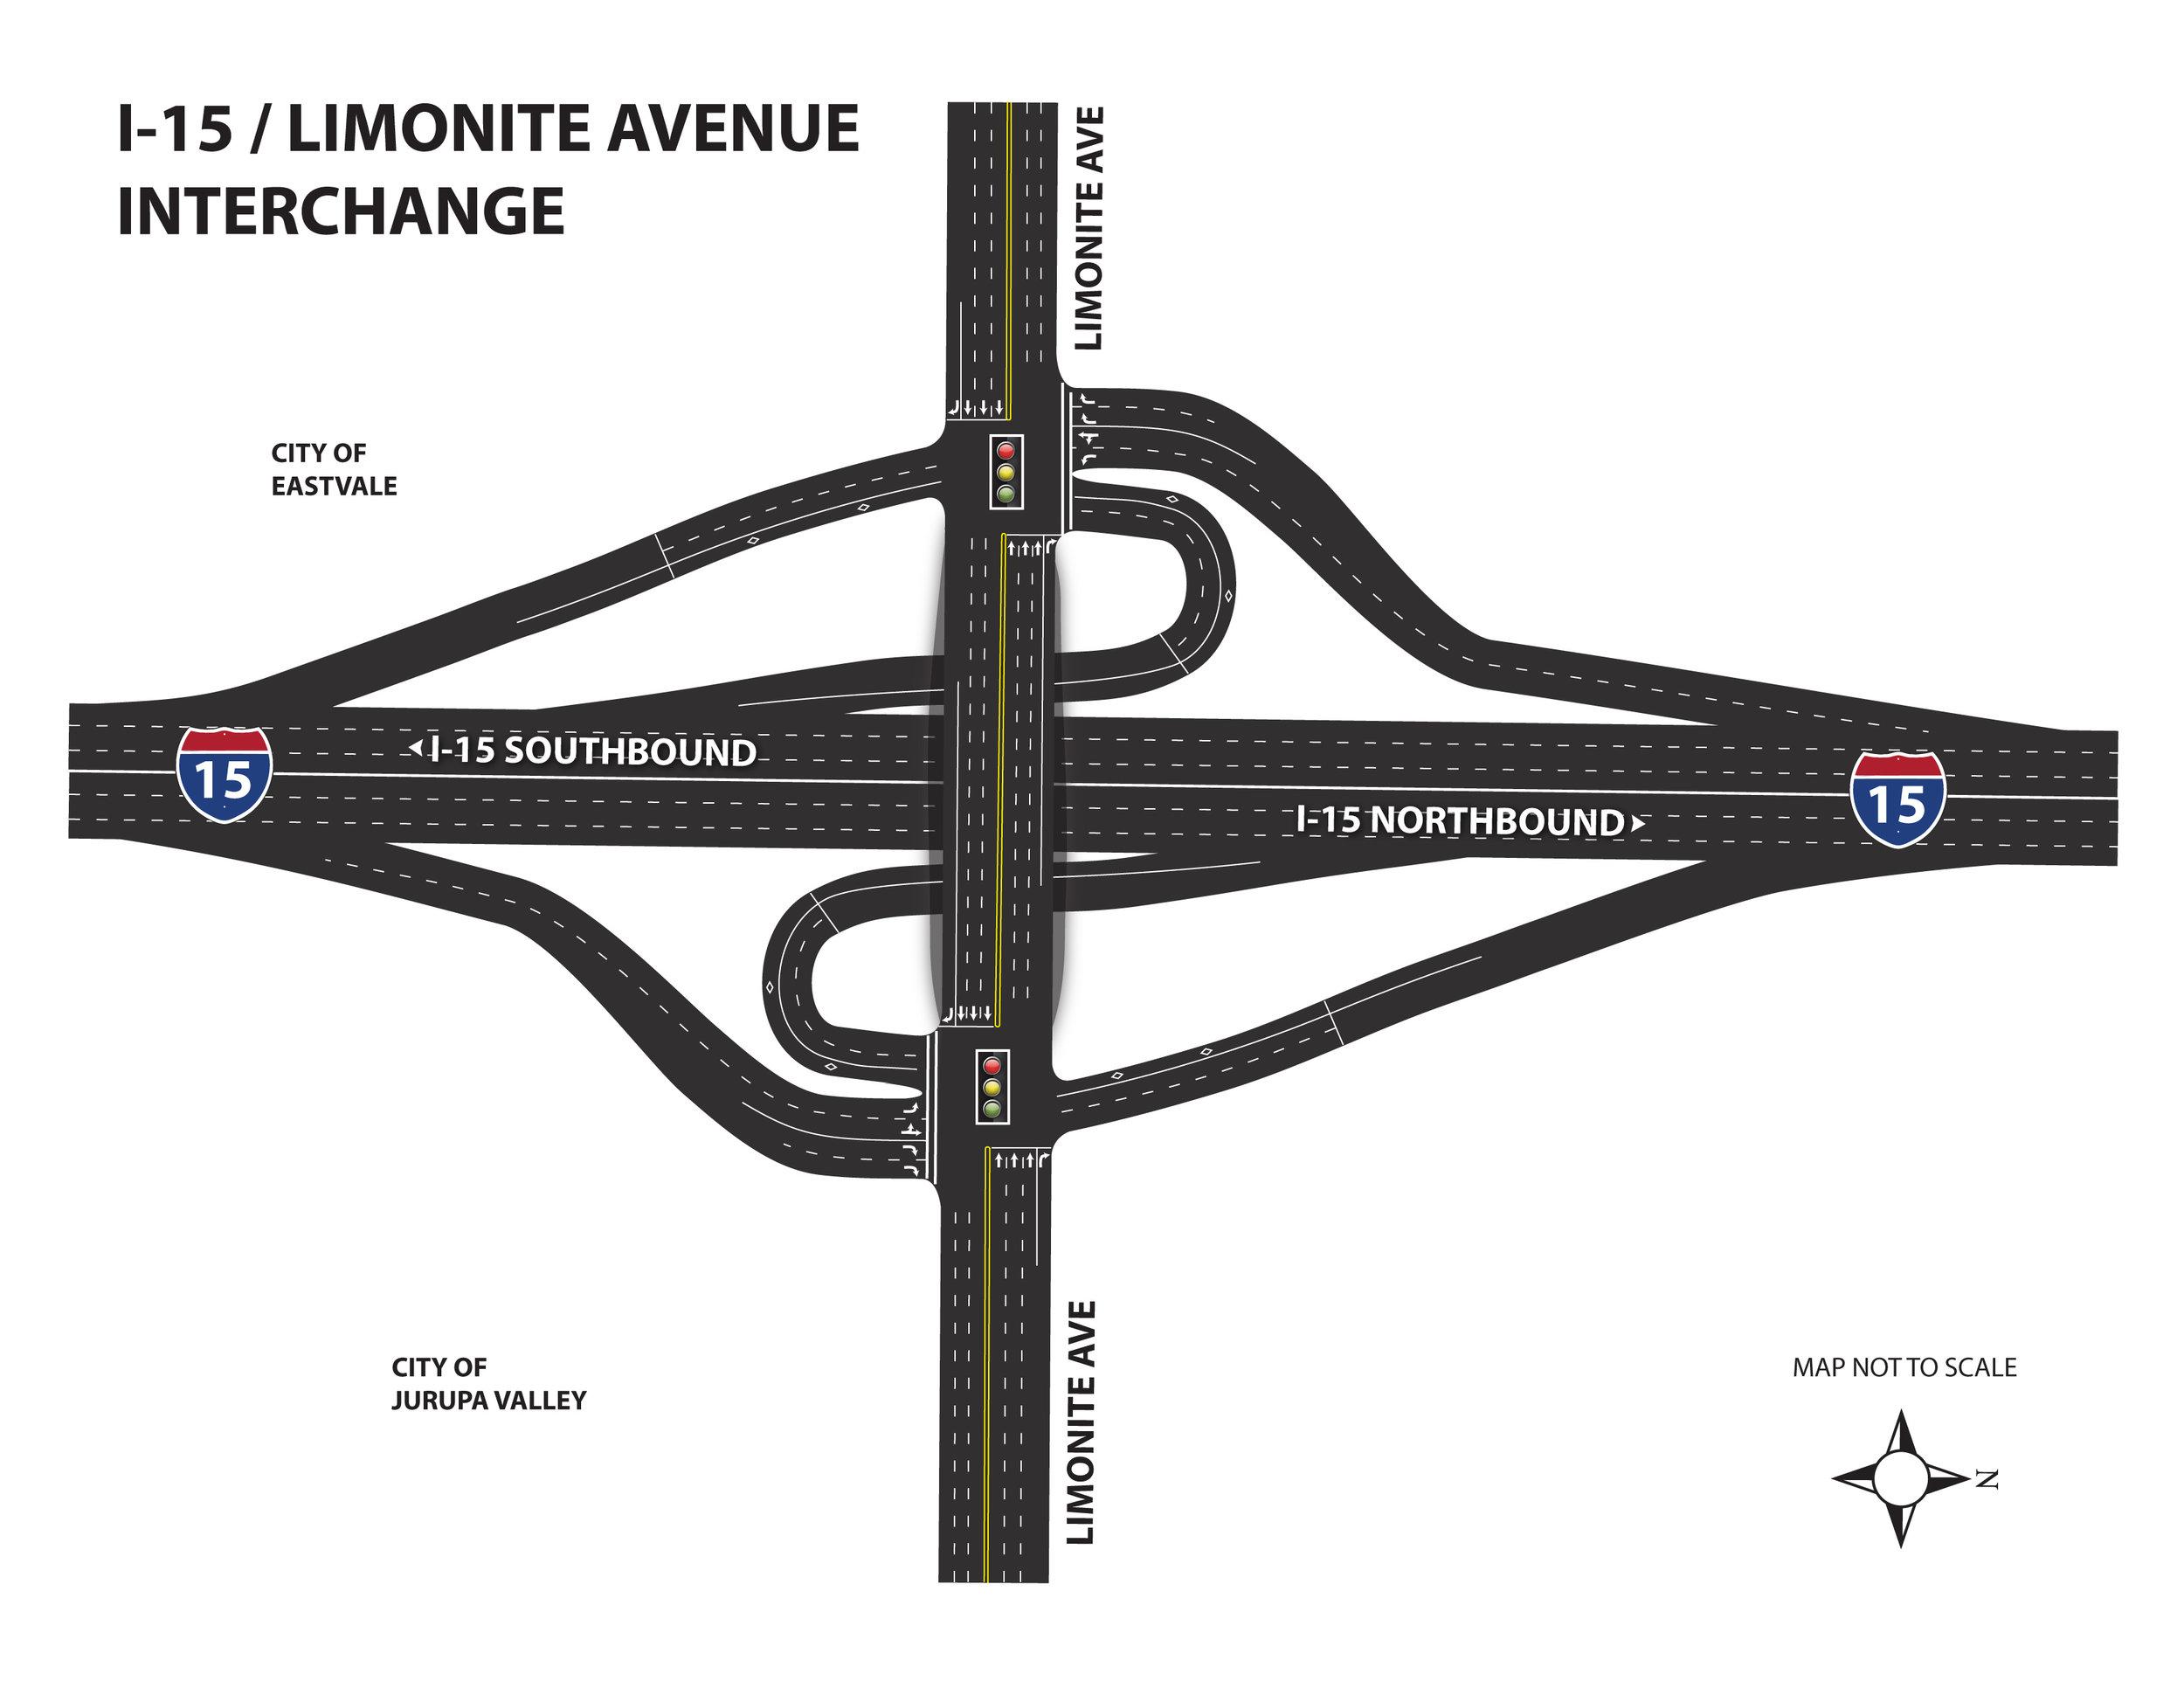 limonite-interchange-4.jpg